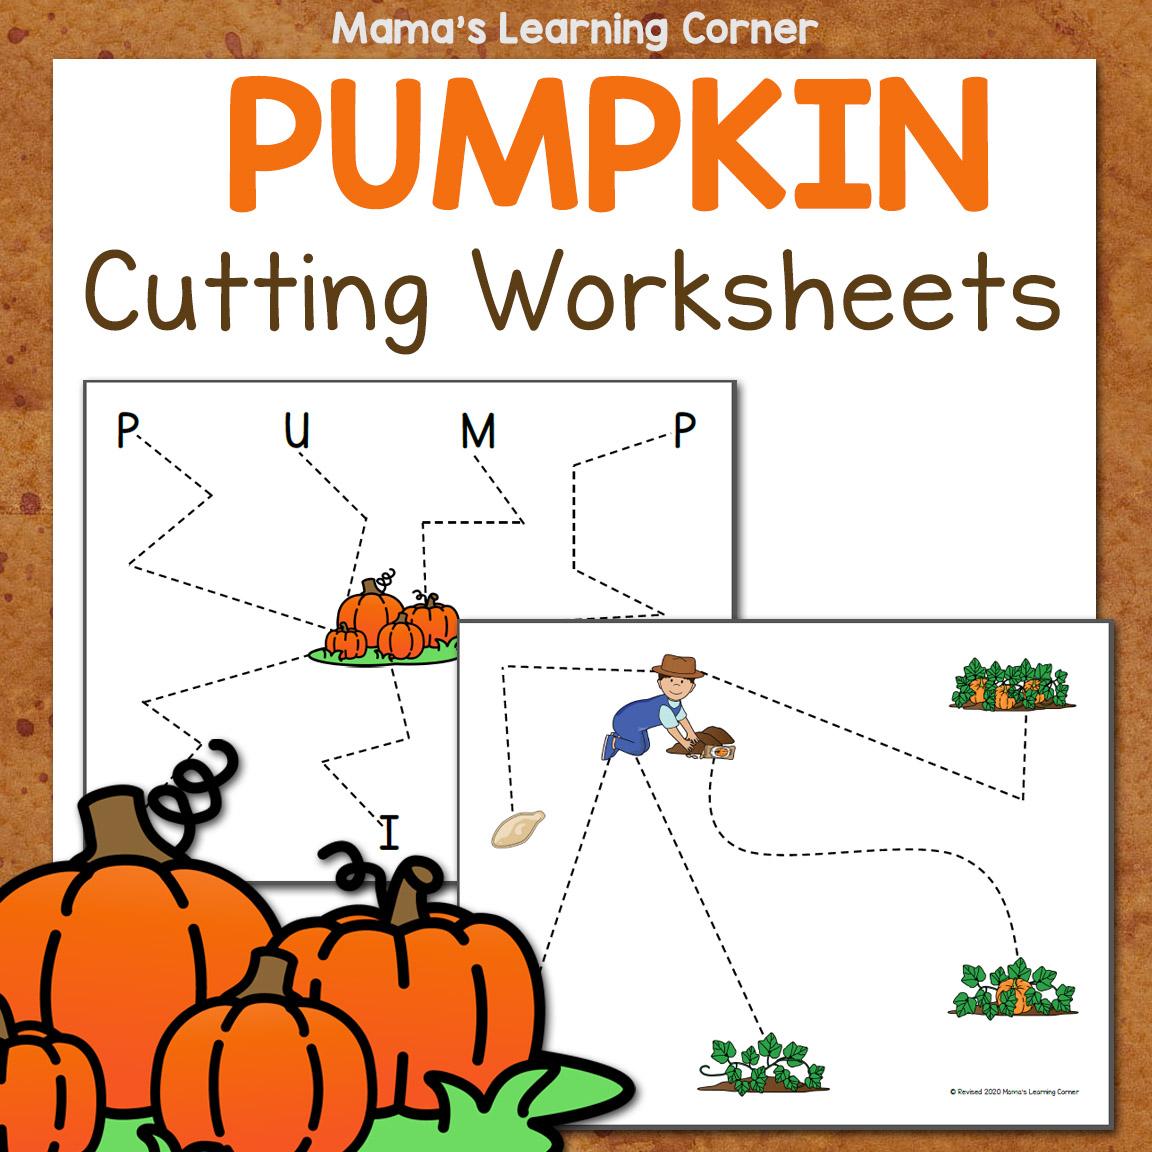 Pumpkin Cutting Worksheets